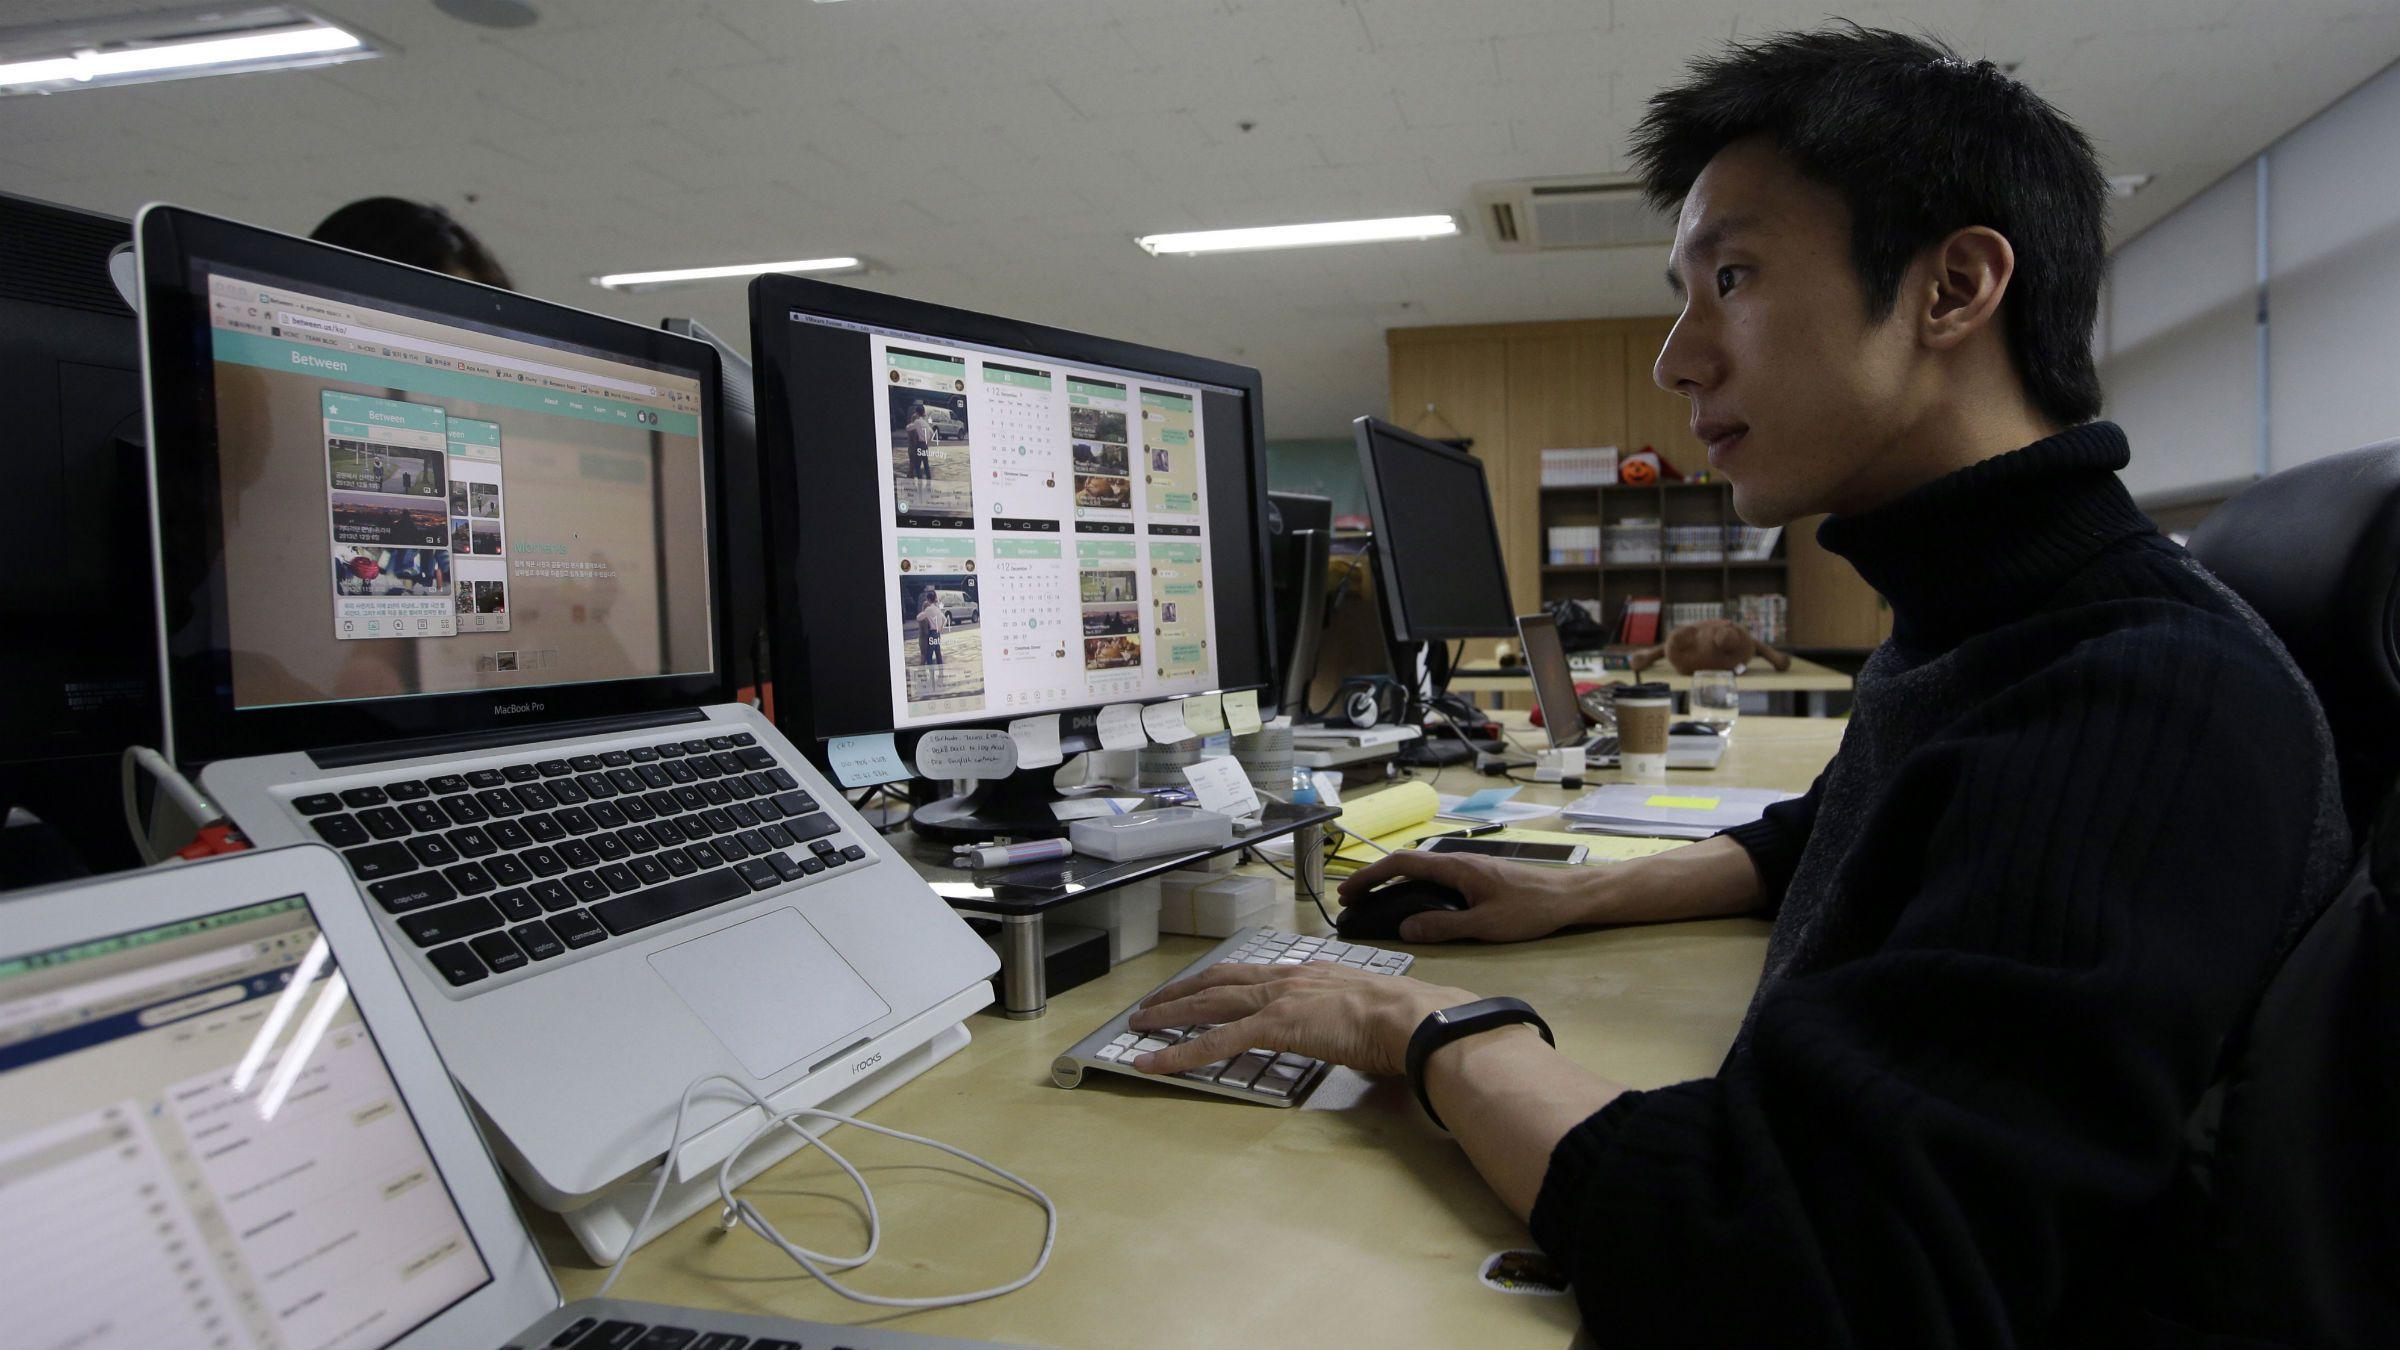 A programmer at work